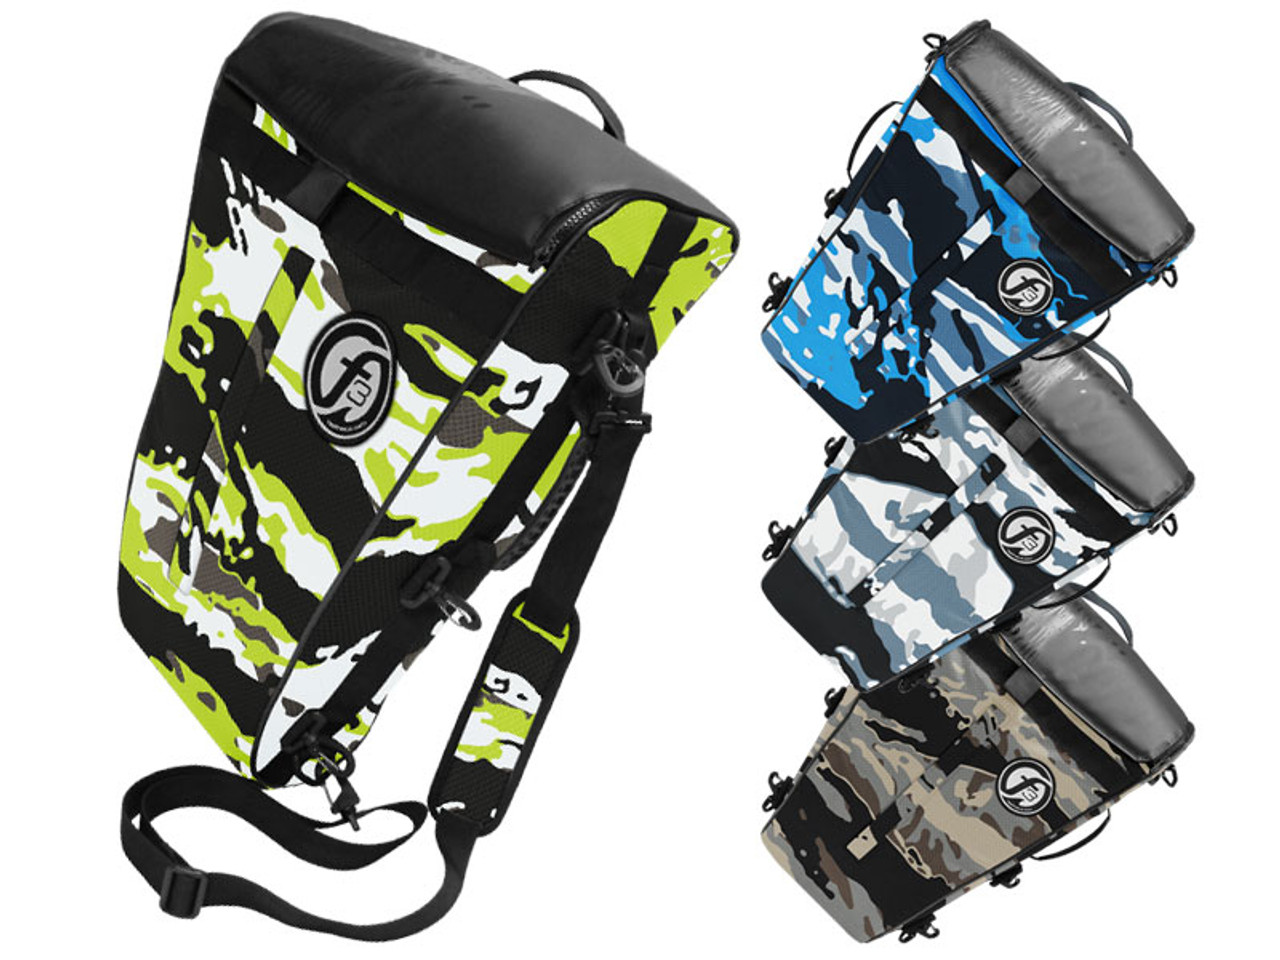 Feel Free Fish Cooler Bag L and M